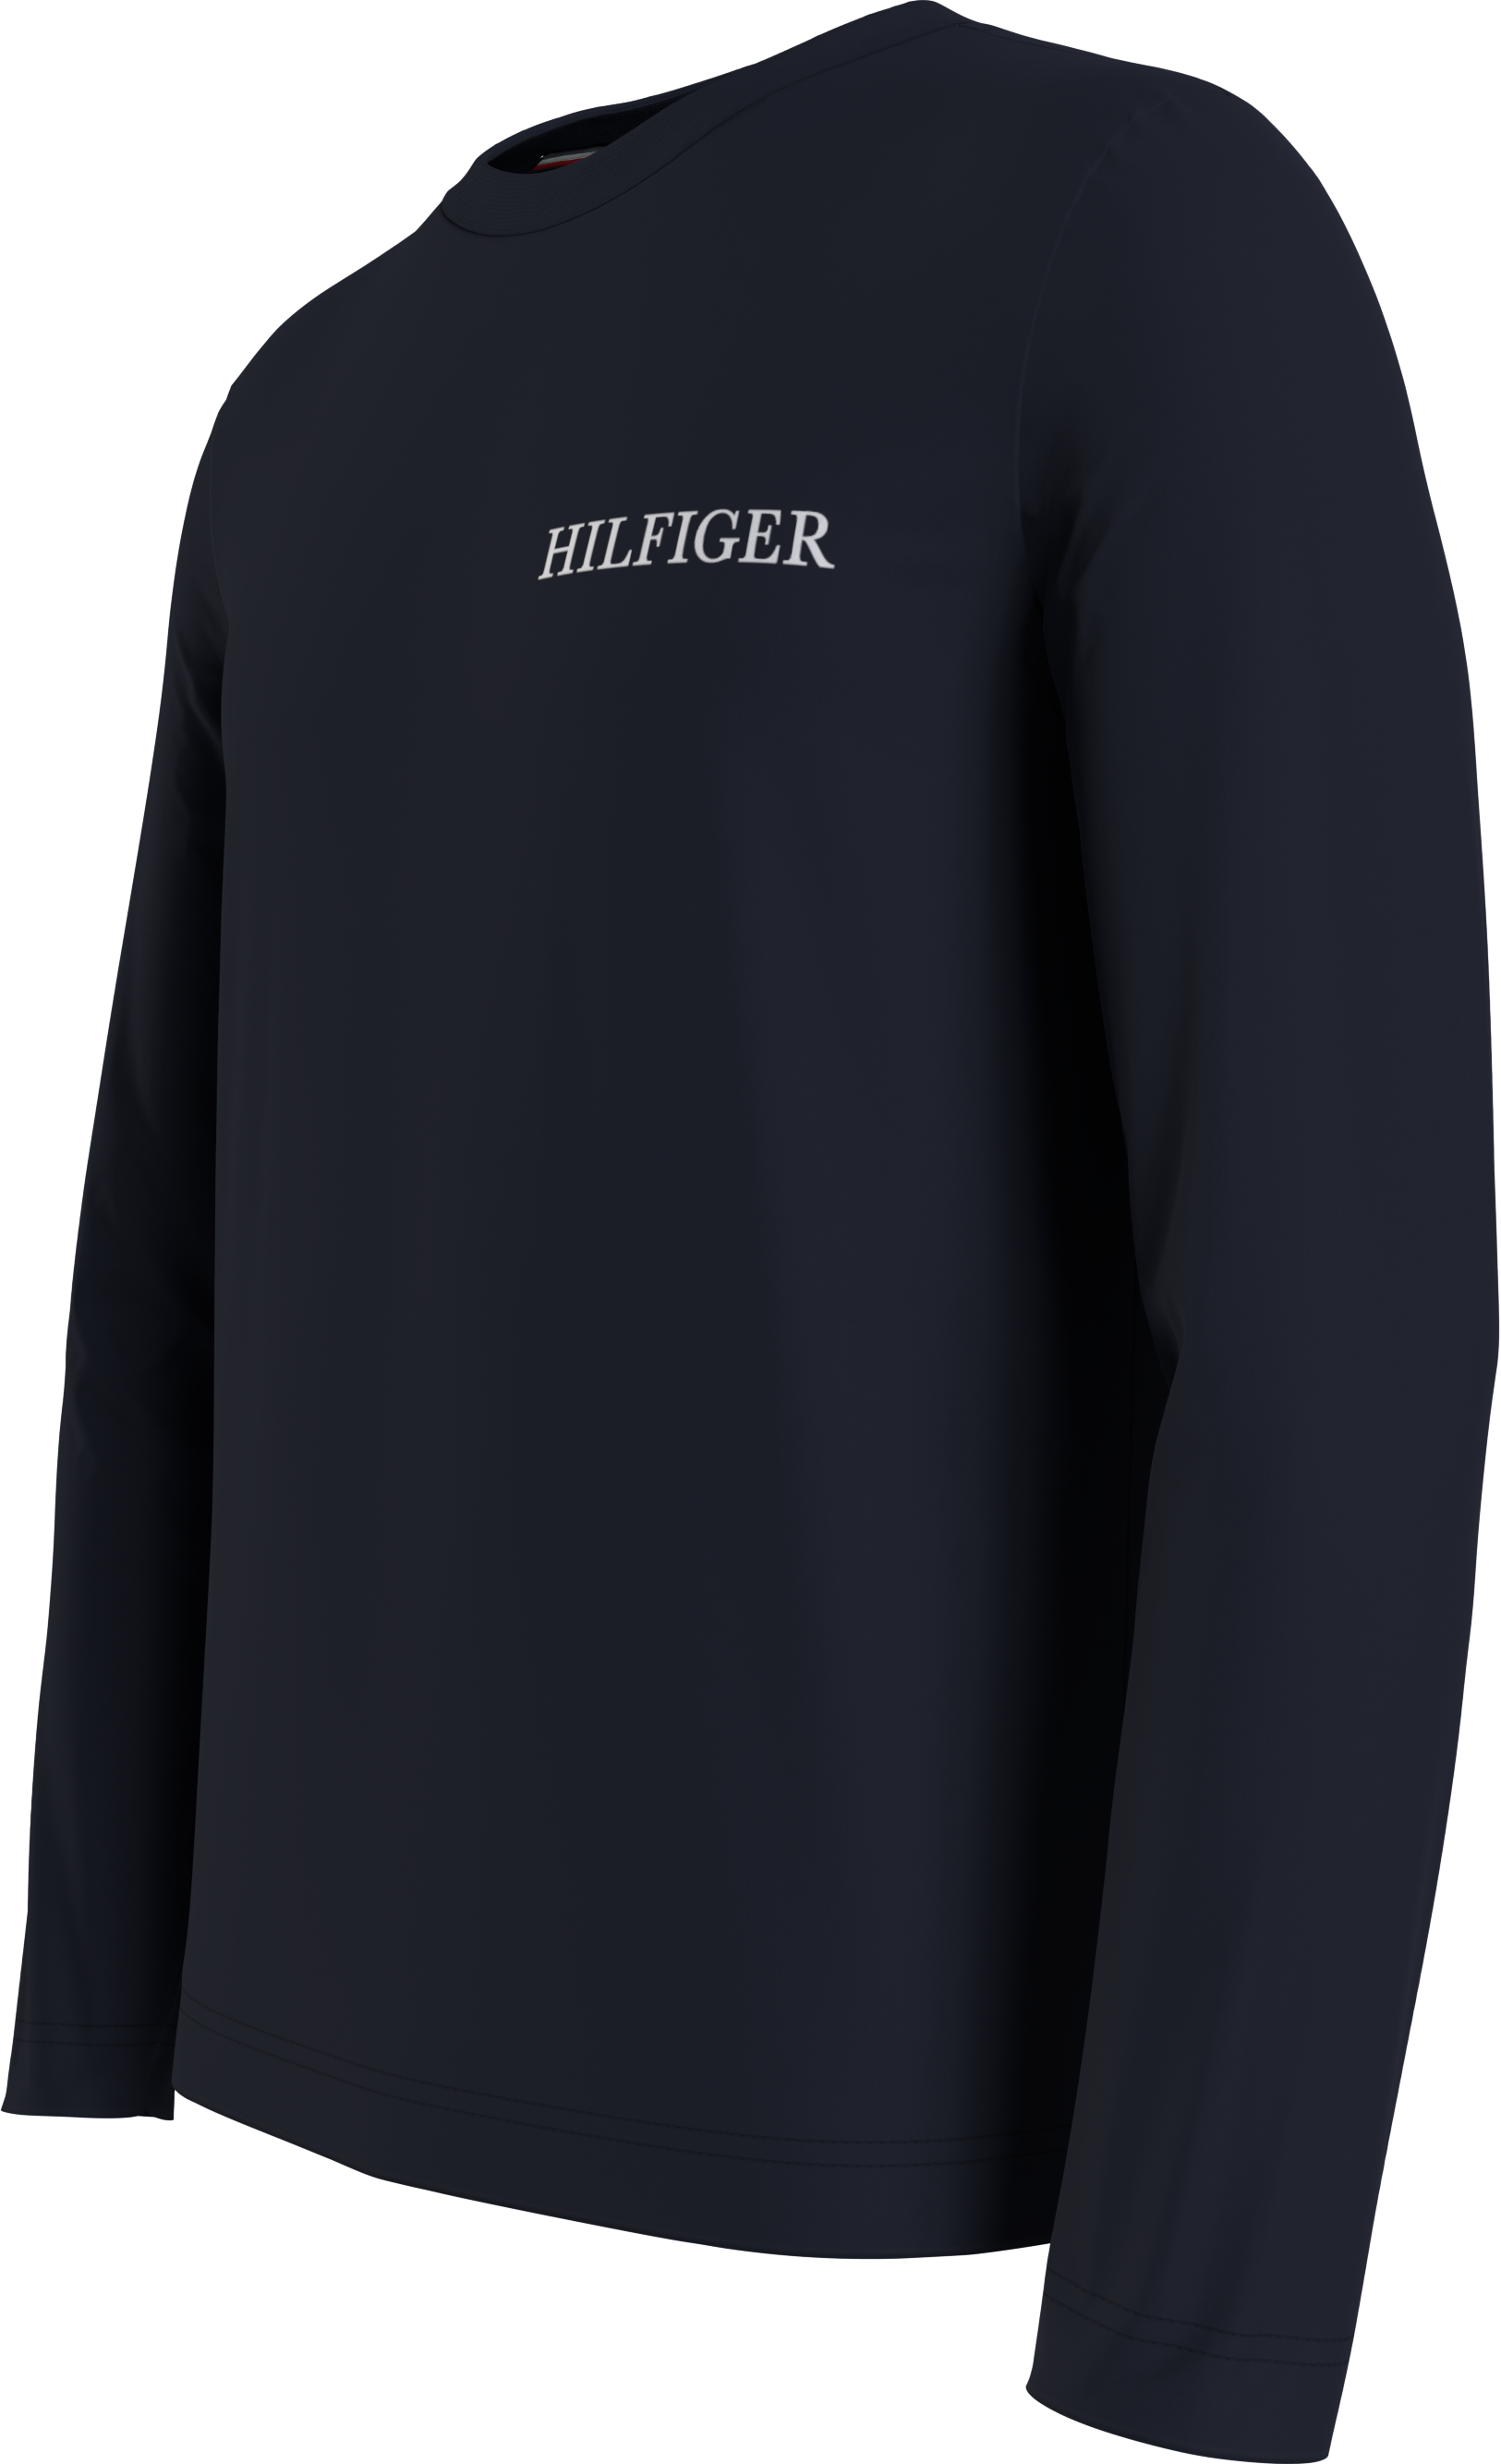 Hilfiger Sweatshirt, Desert Sky, XL